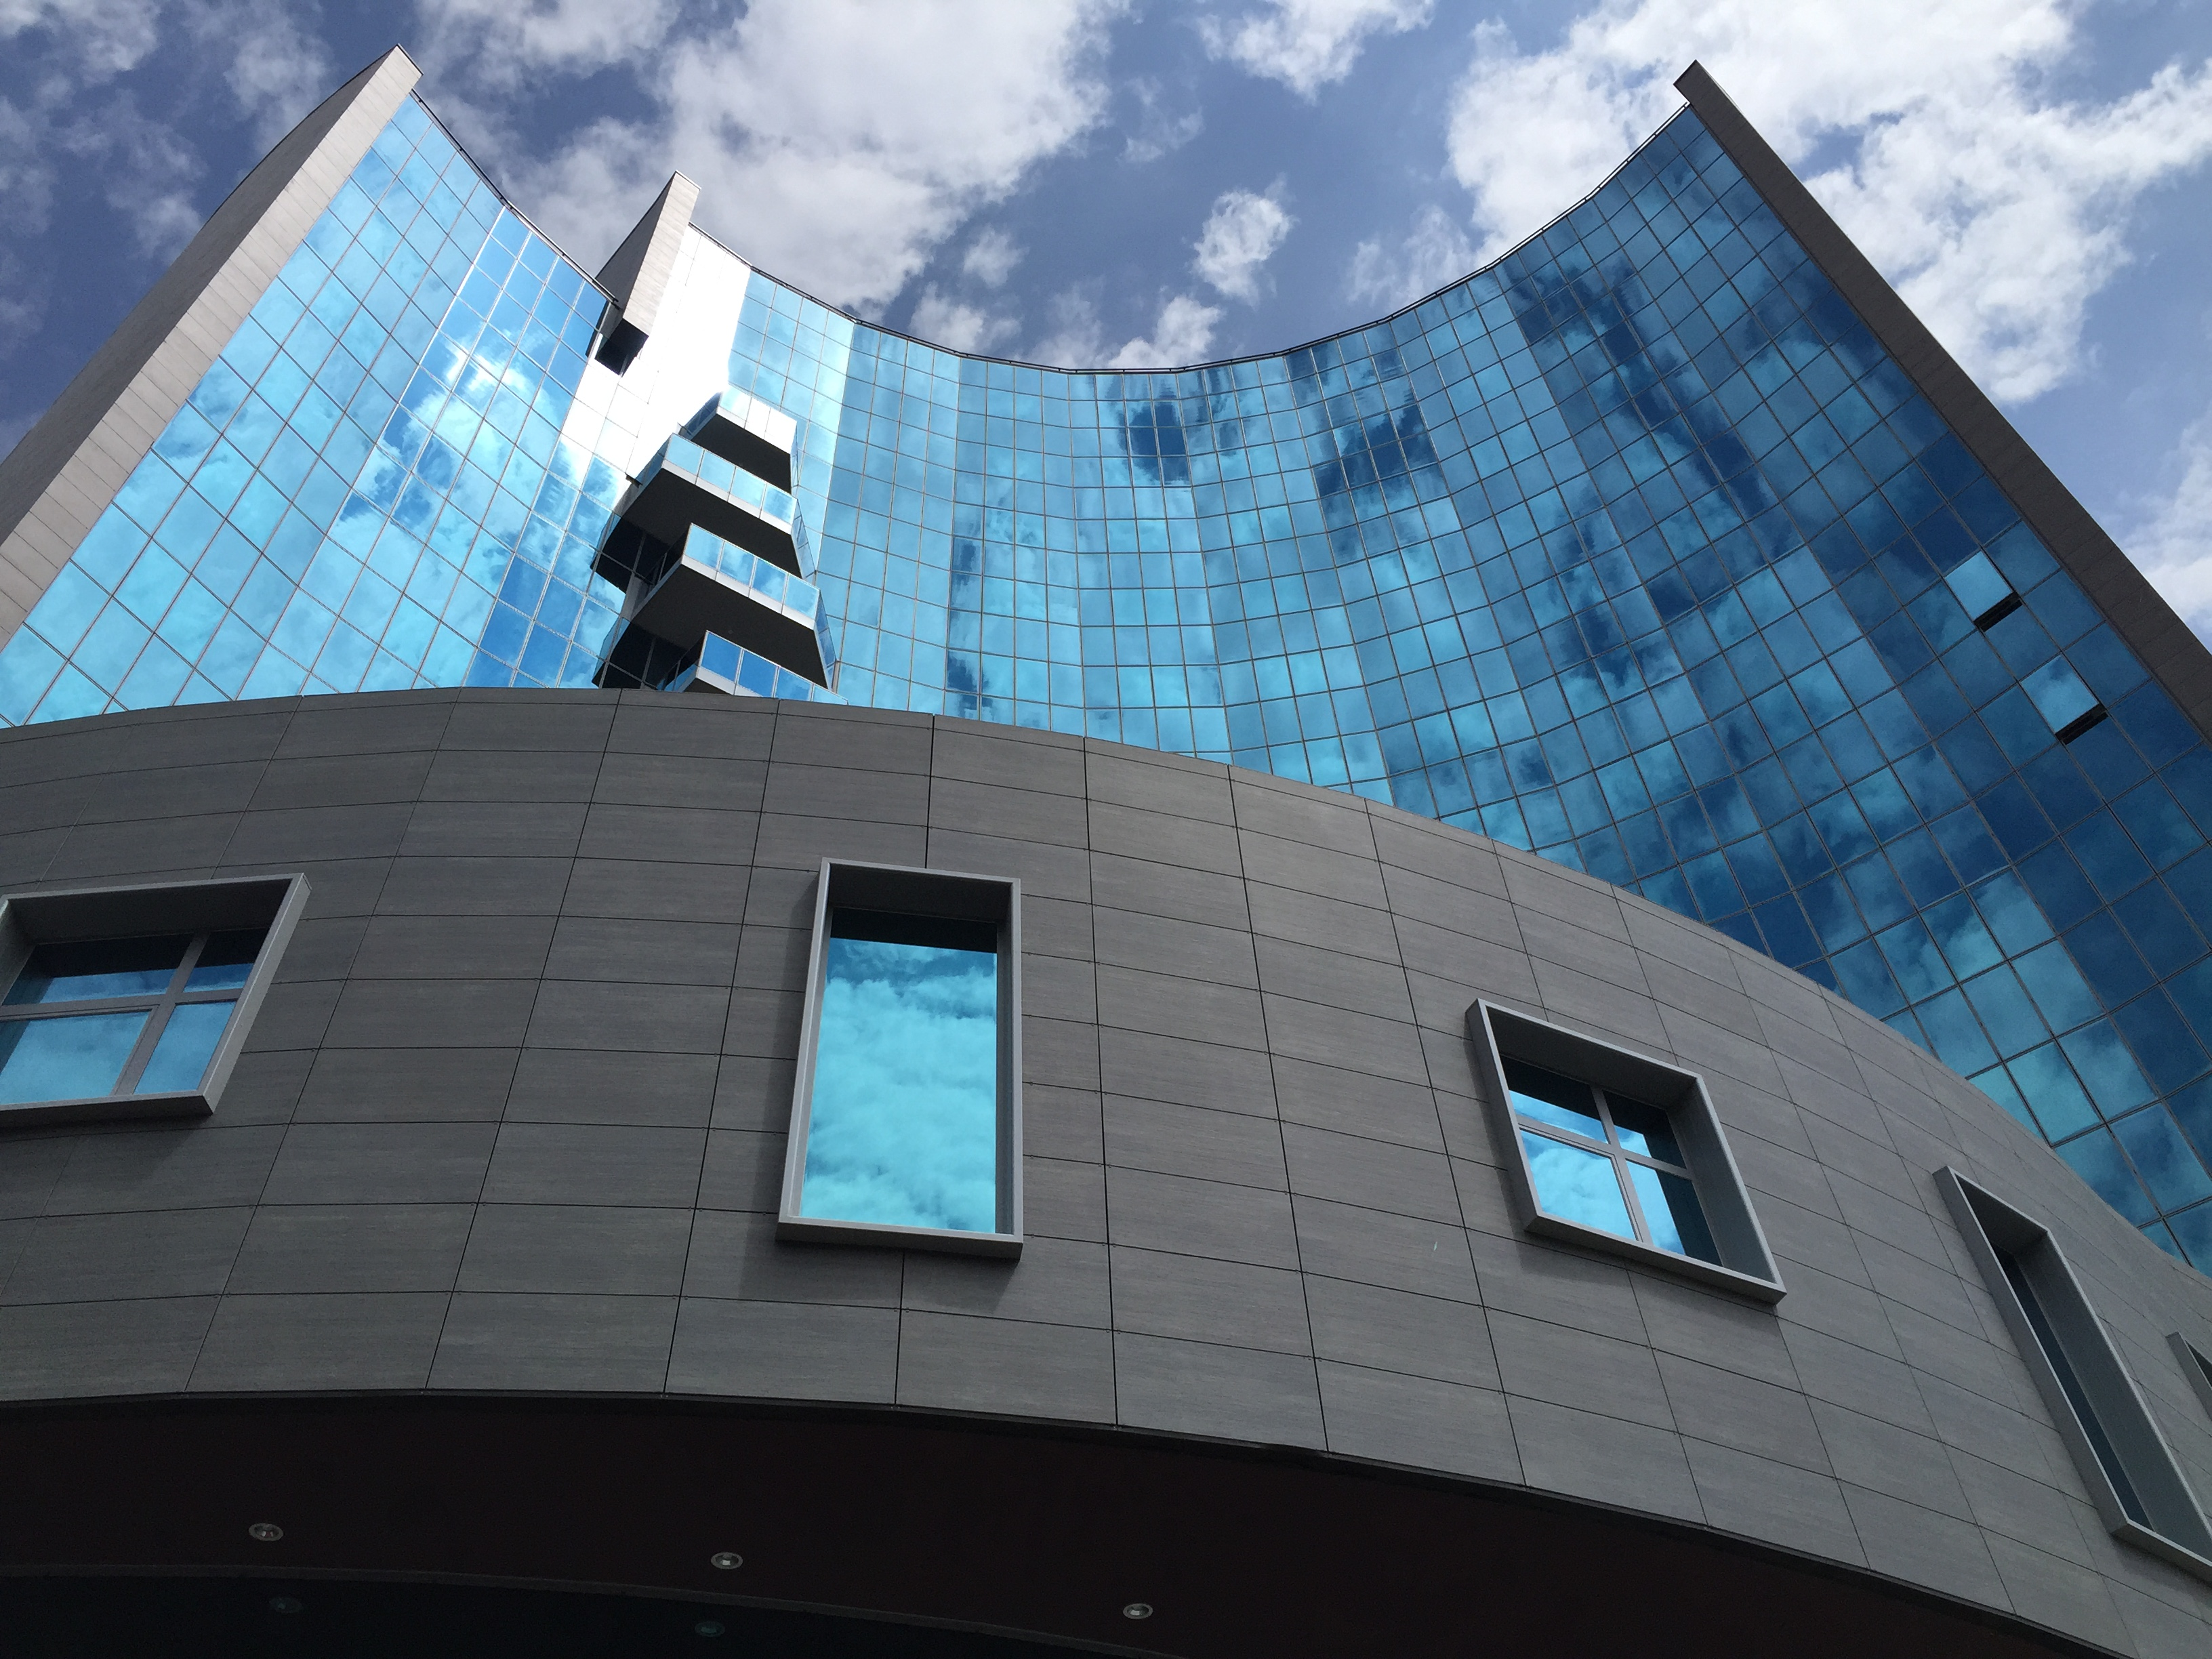 Monte Porzio glass parapets